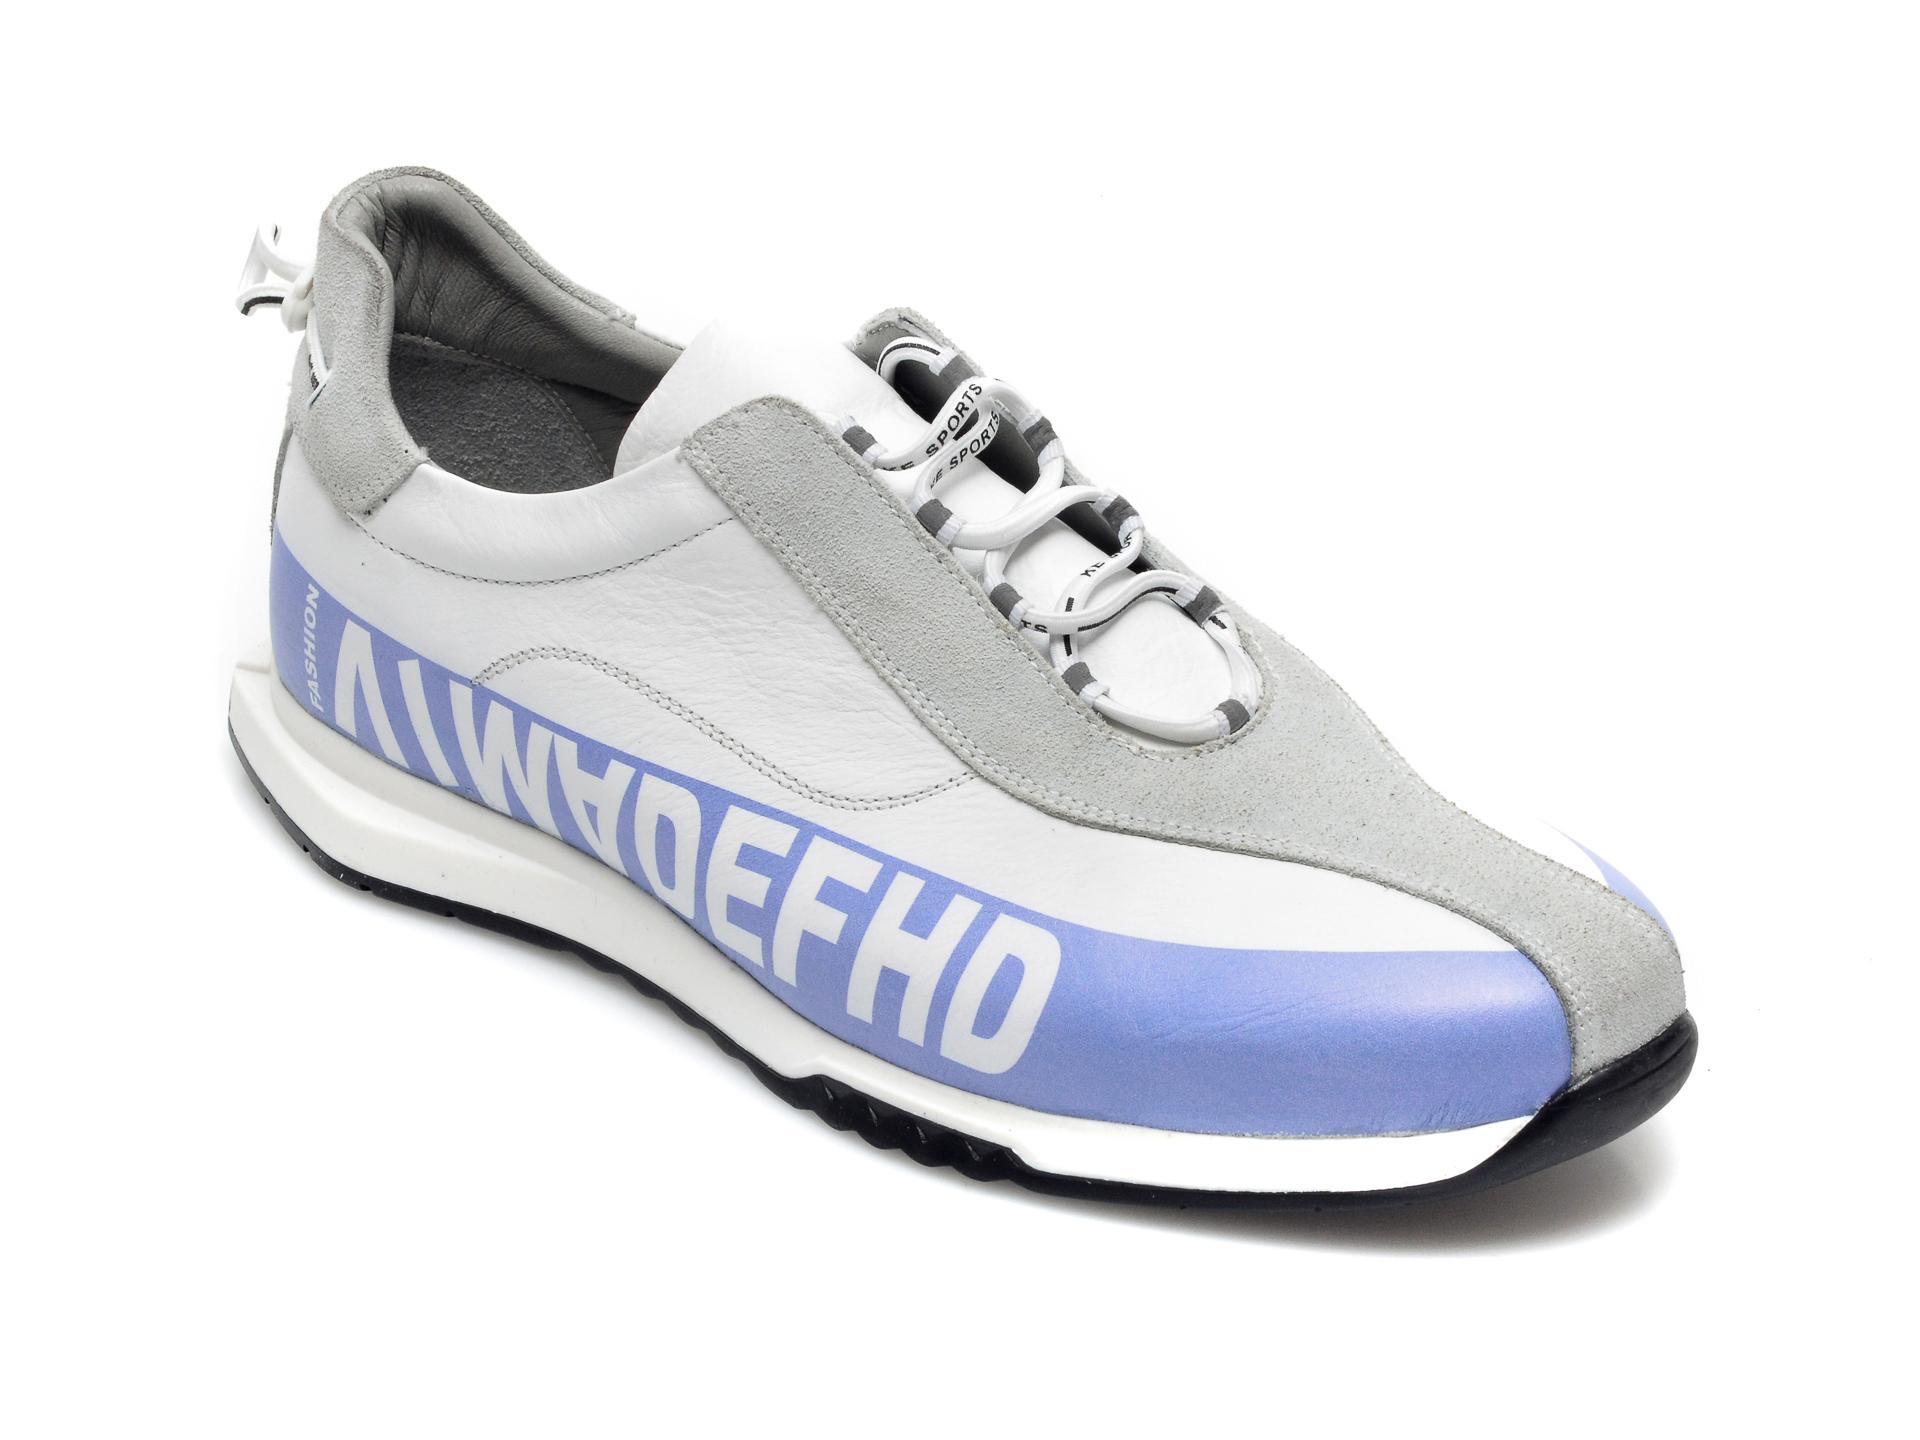 Pantofi sport OTTER albi, 26703, din piele naturala imagine